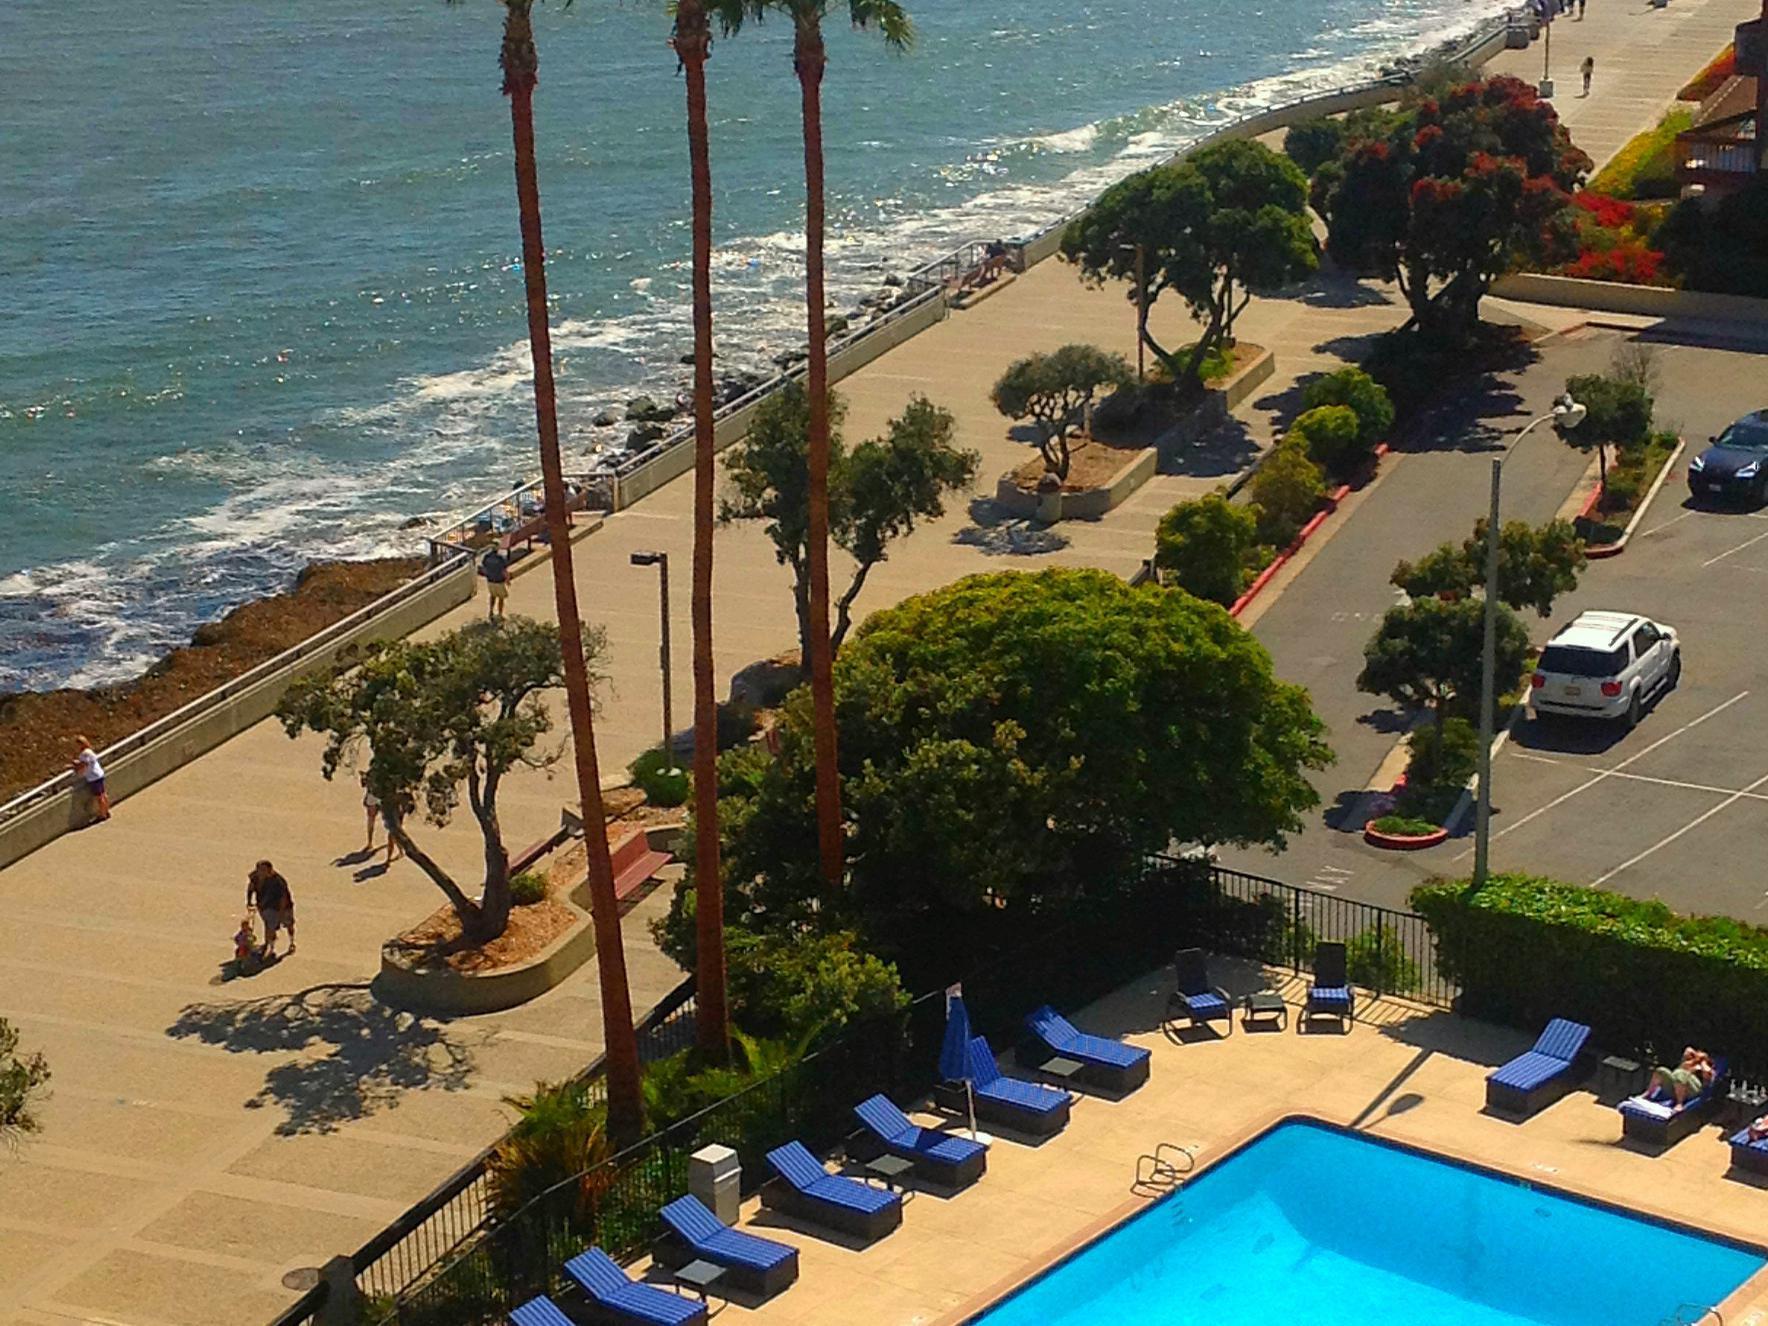 Crowne Plaza Ventura Beach Hotel Swimming Pool Swimmign Photo